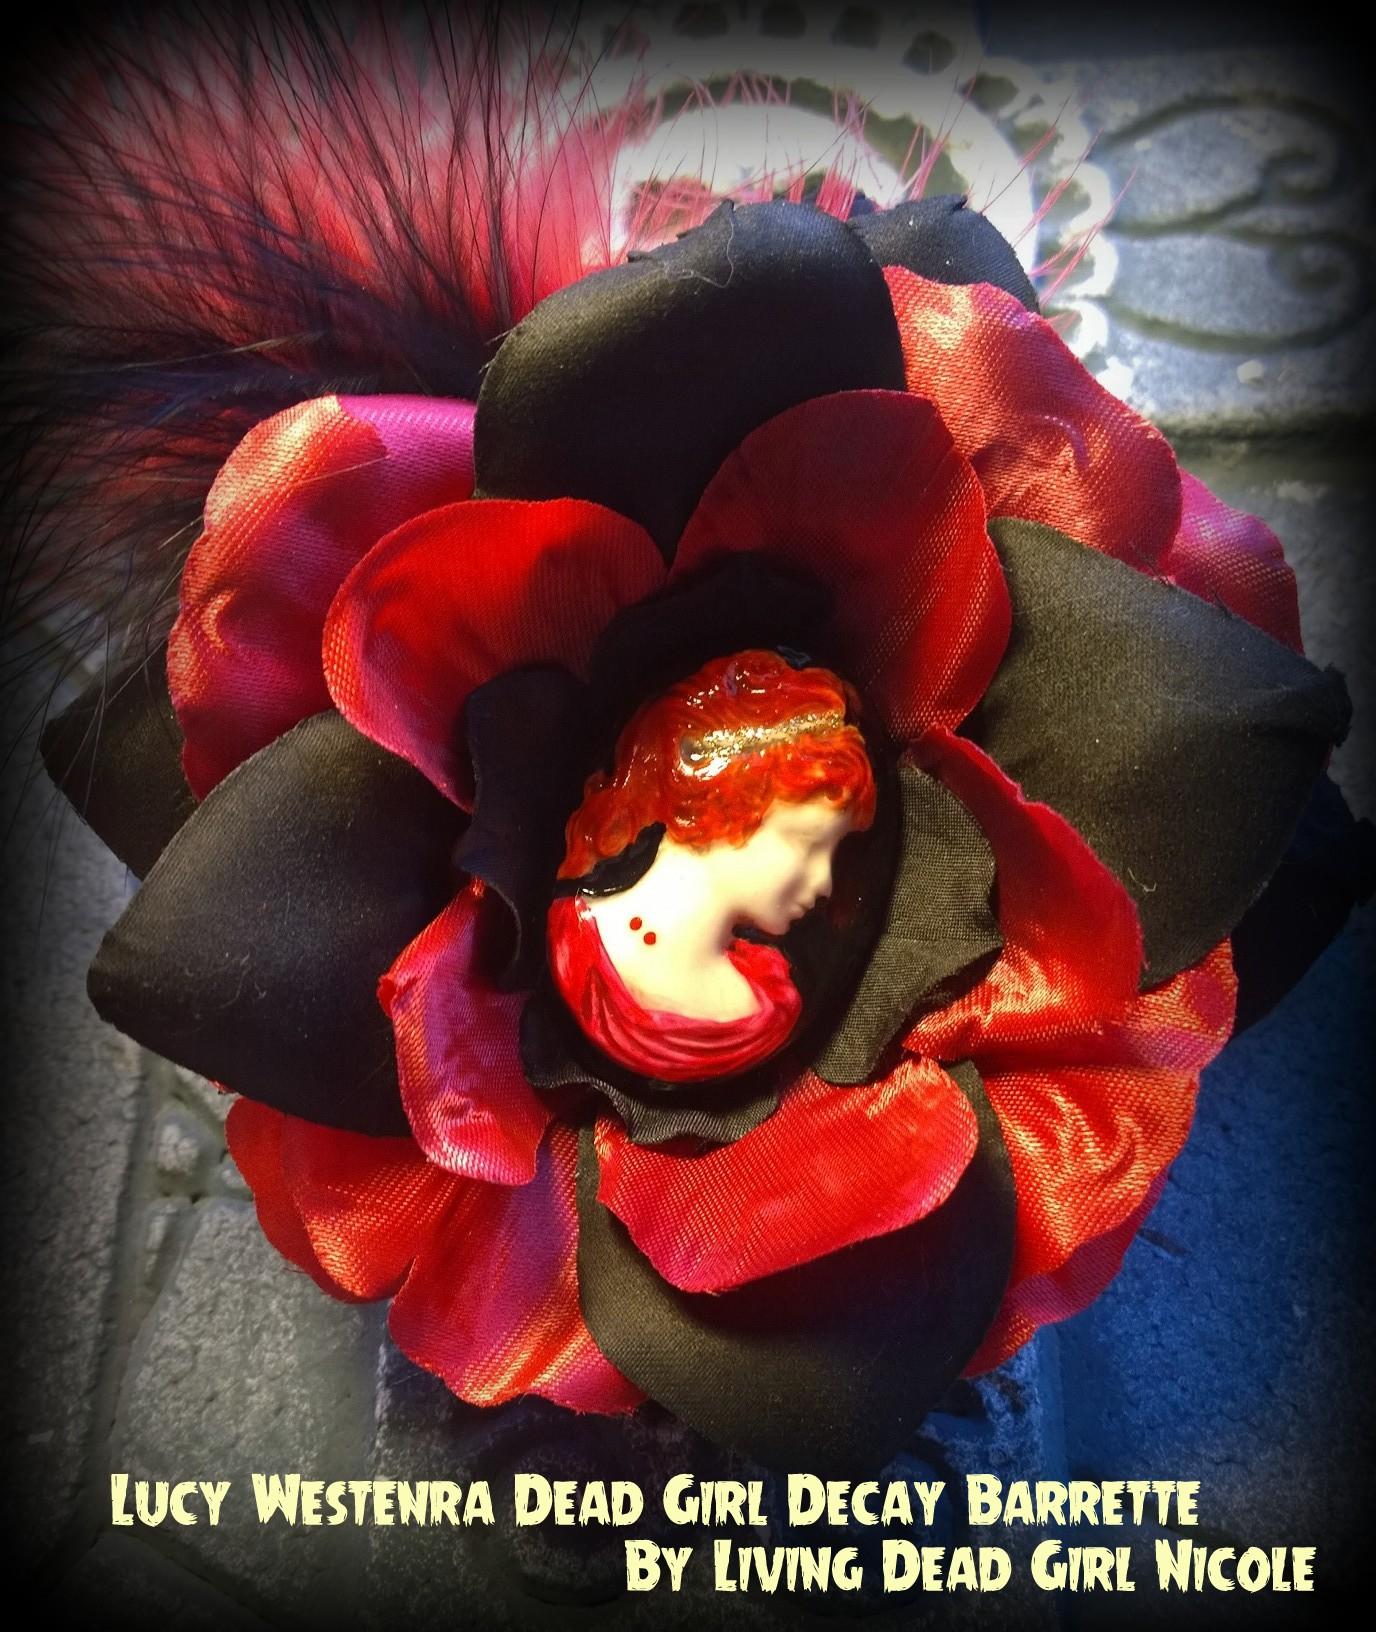 Lucy Bram Stoker Dracula Barrette